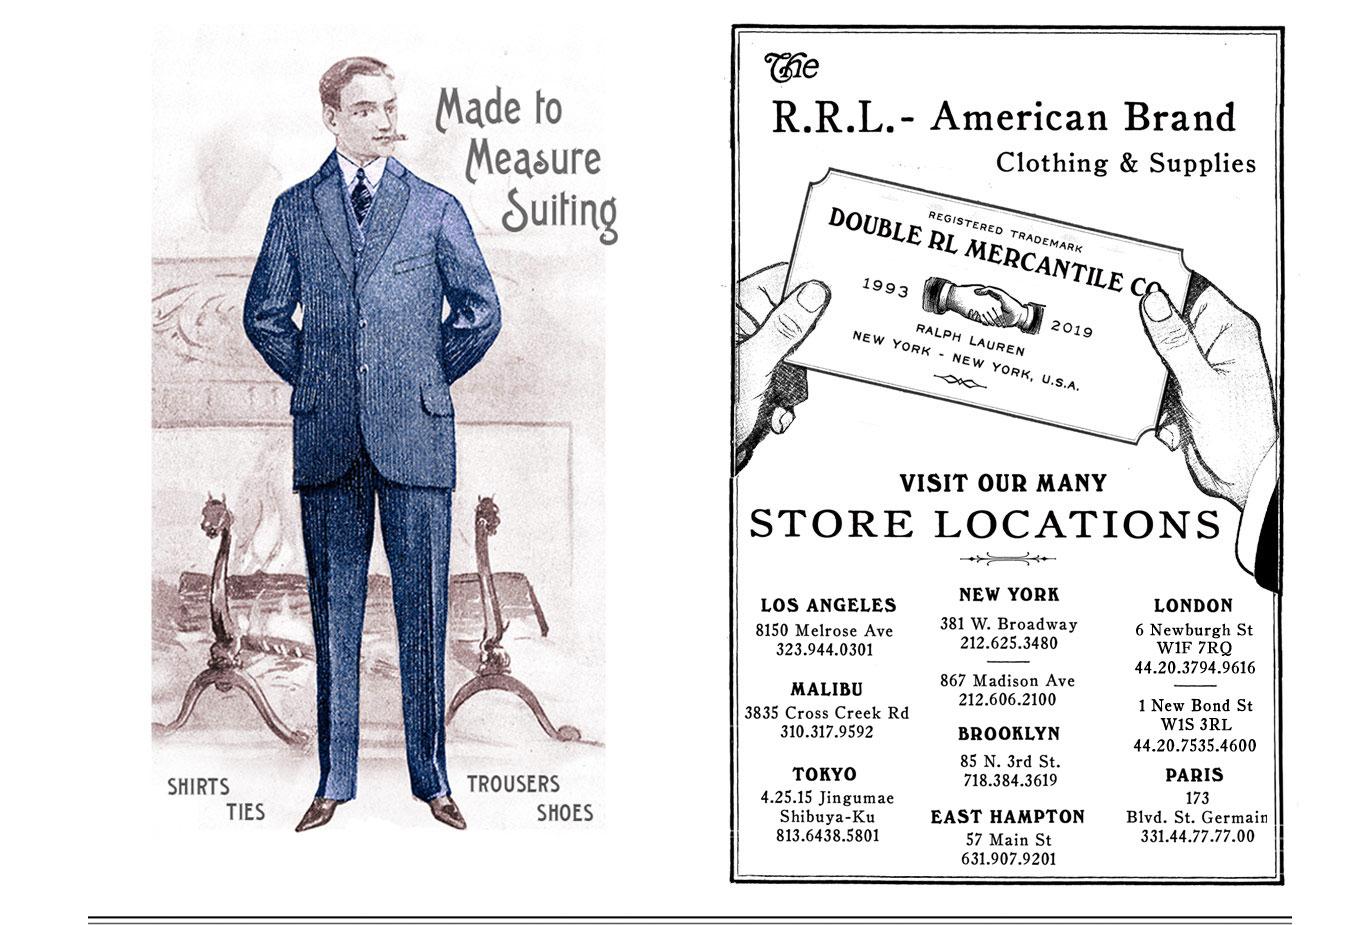 Illustration of man in navy pinstripe suit